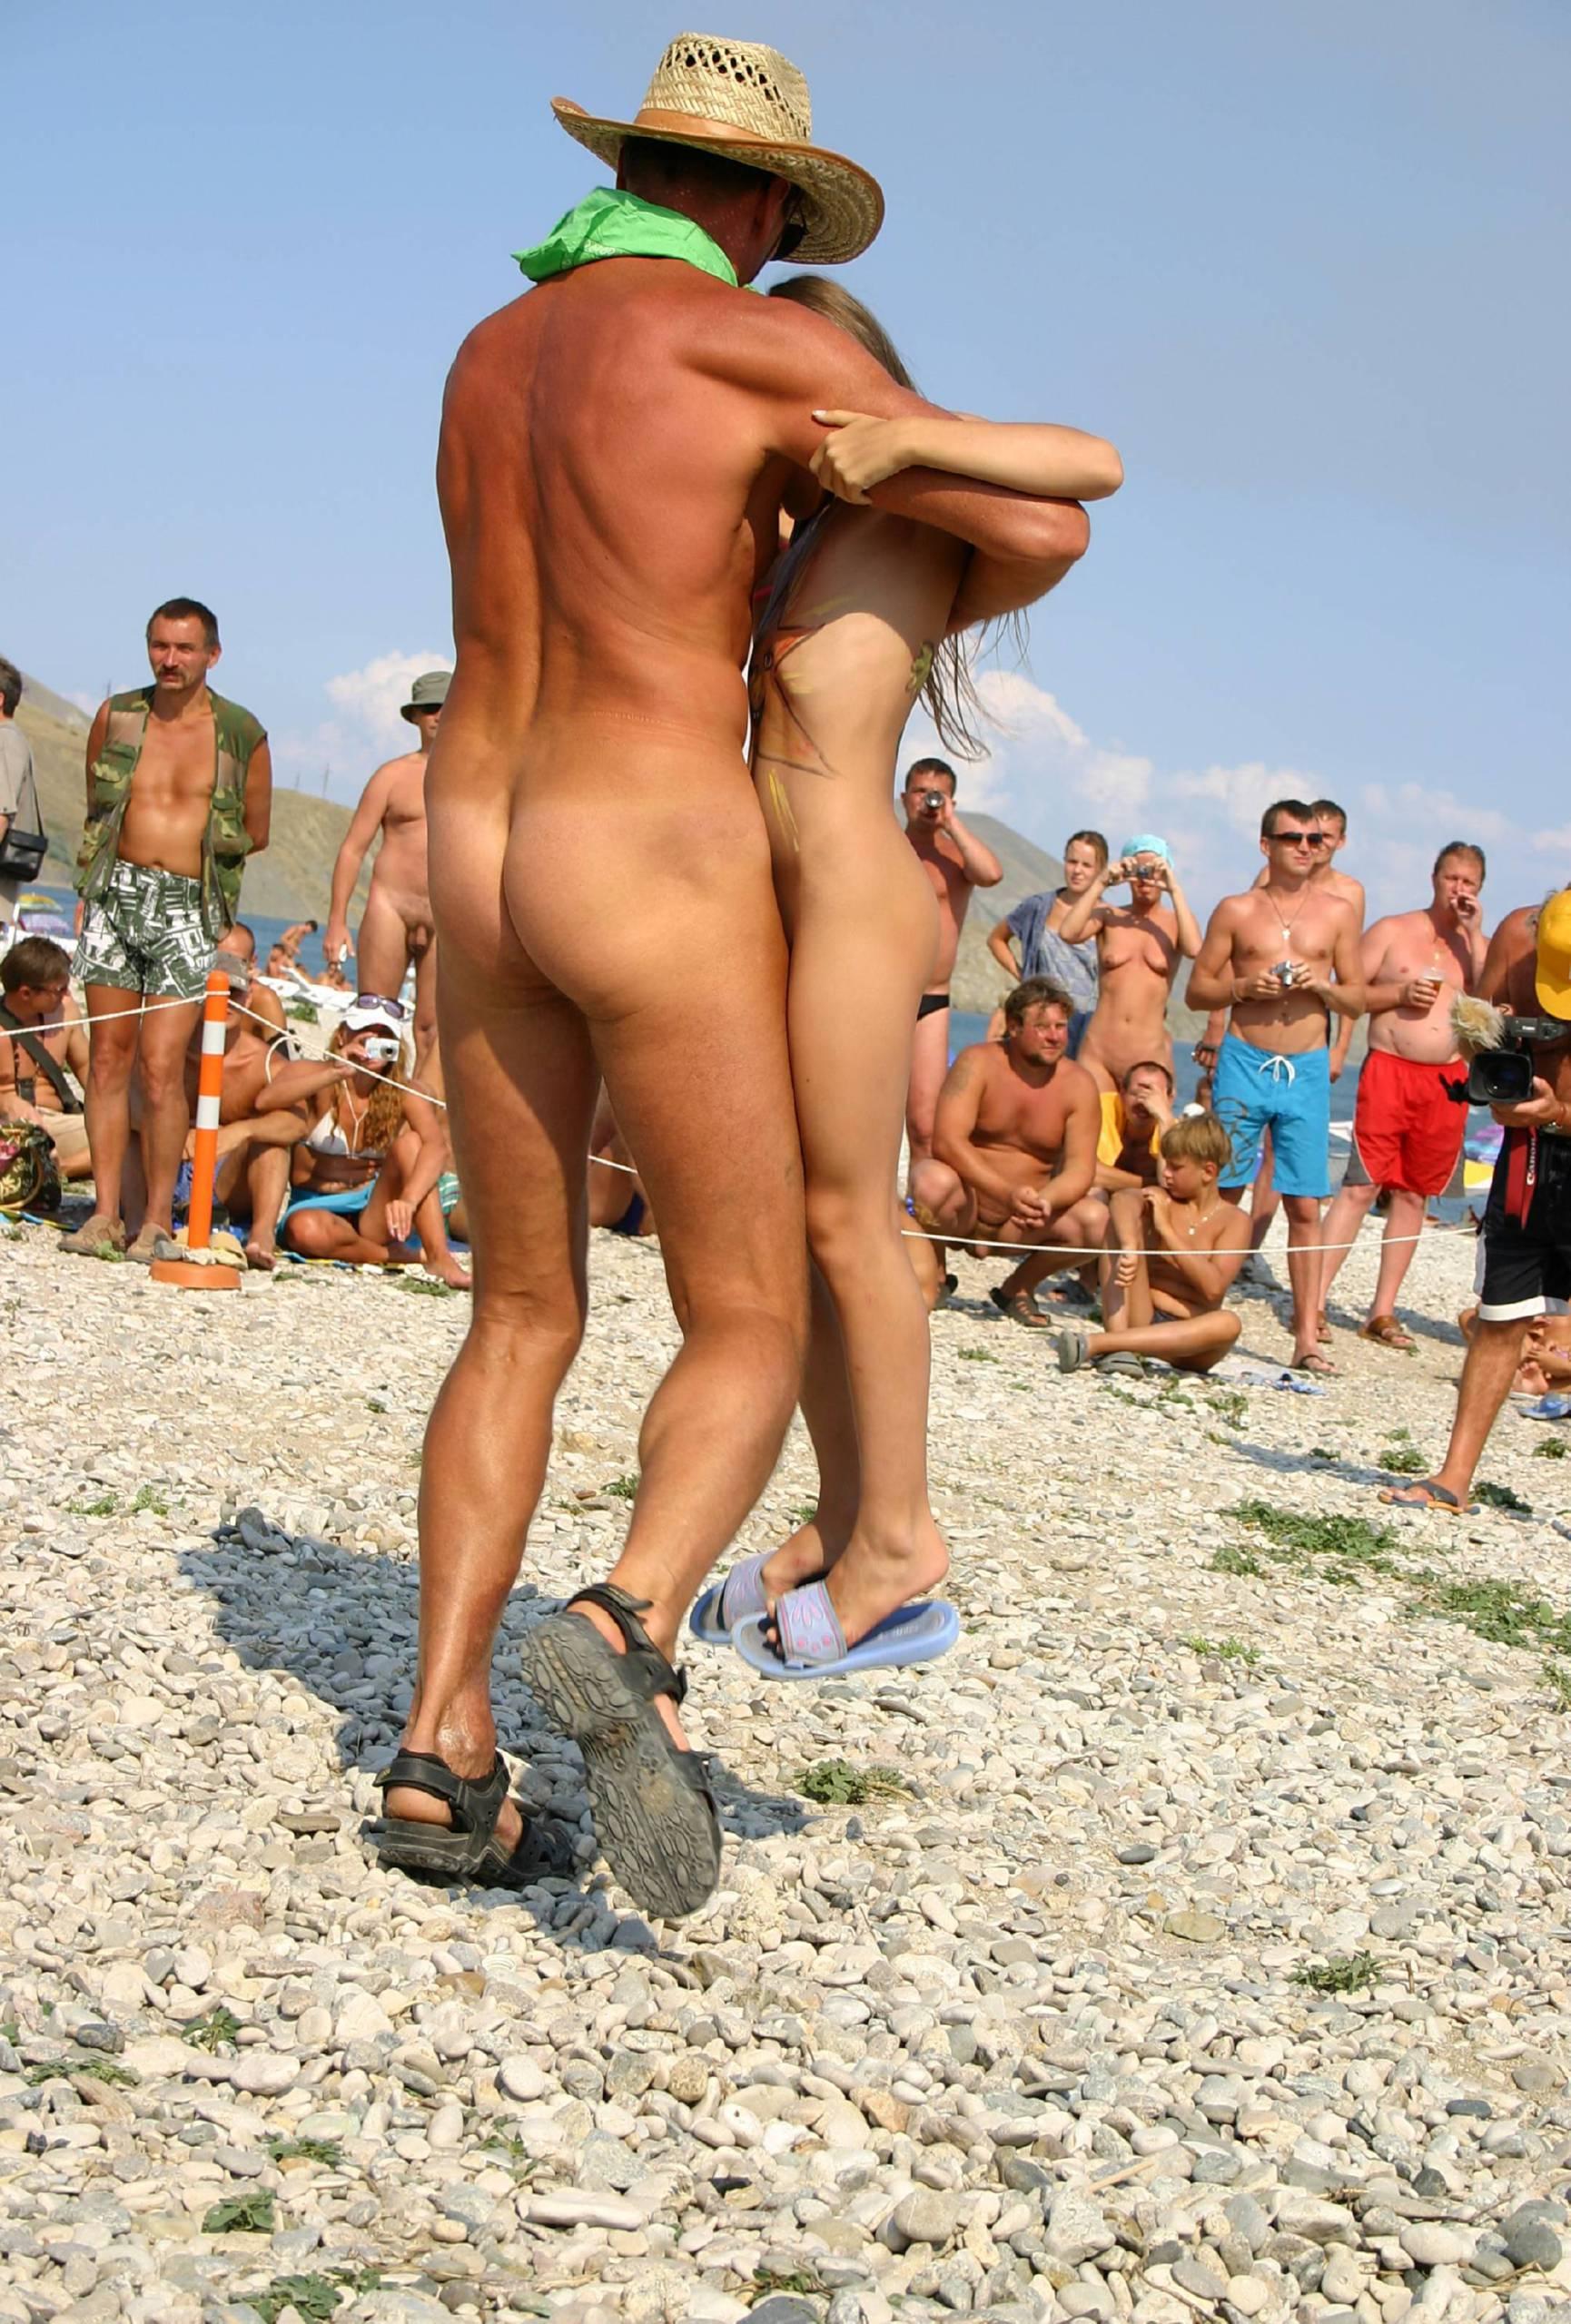 Nudist Photos Sandy Dancing Partners - 1